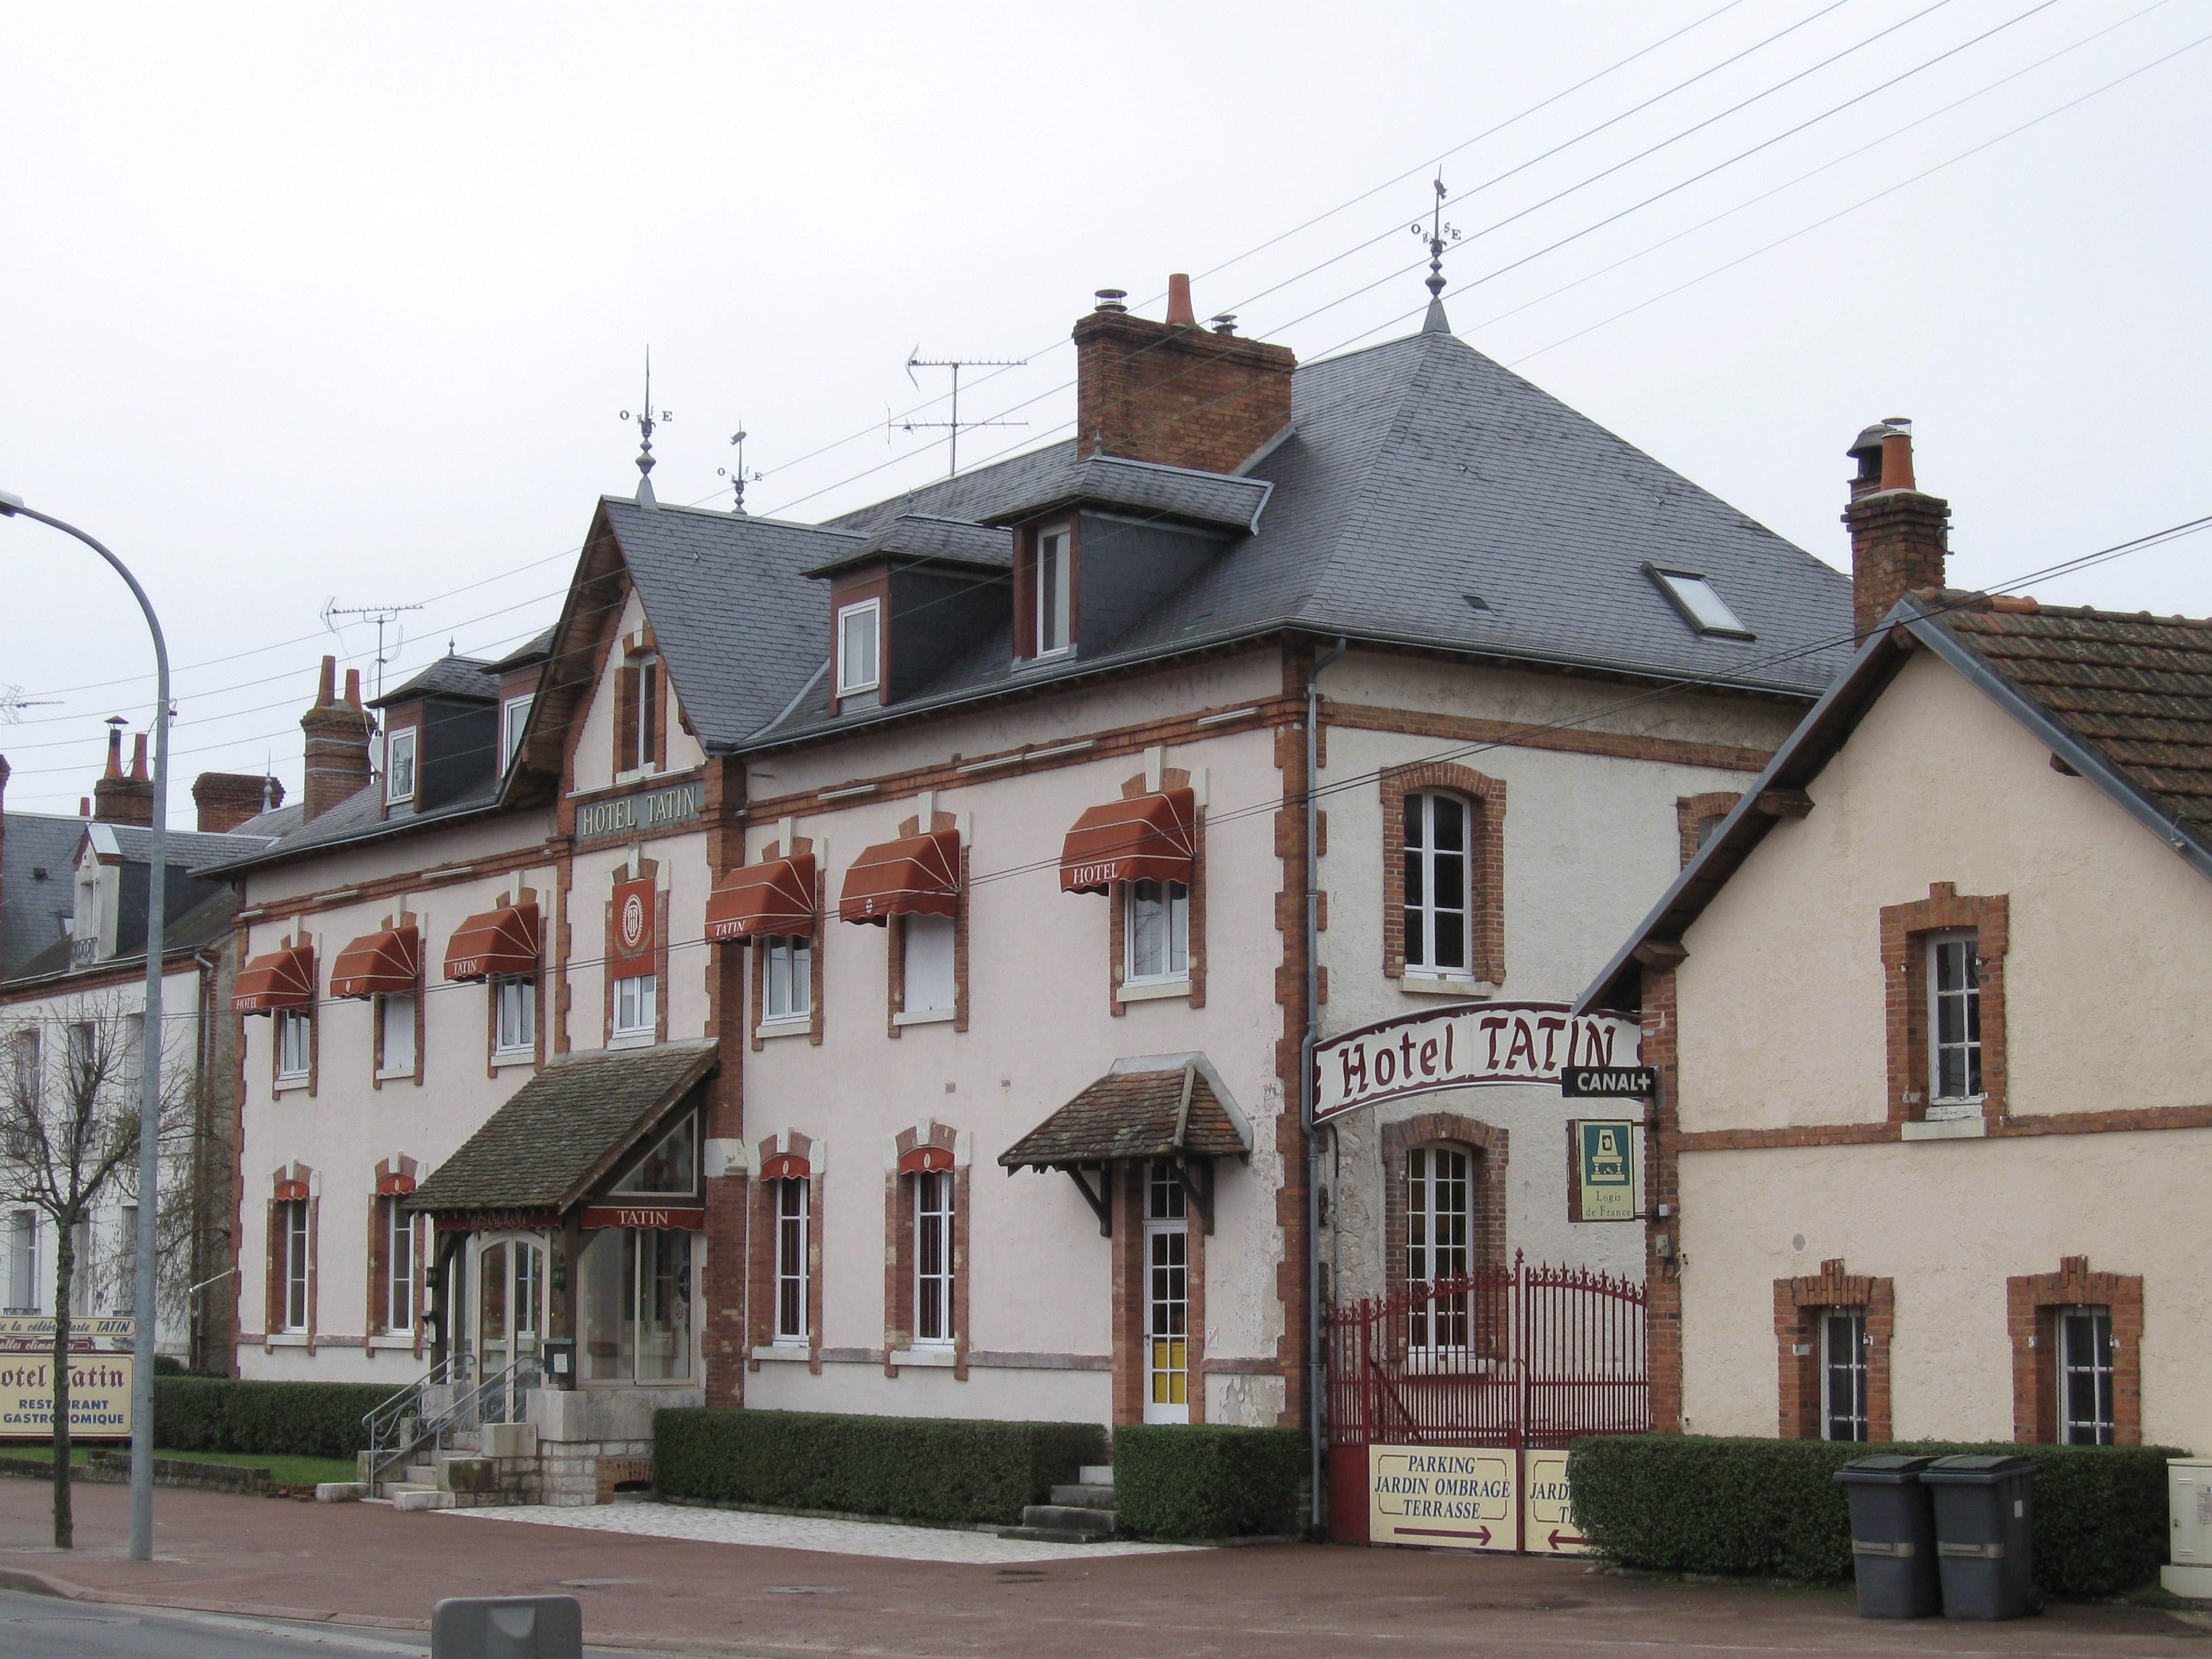 File:Lamotte-Beuvron hôtel-restaurant Tatin 1.jpg - Wikimedia Commons